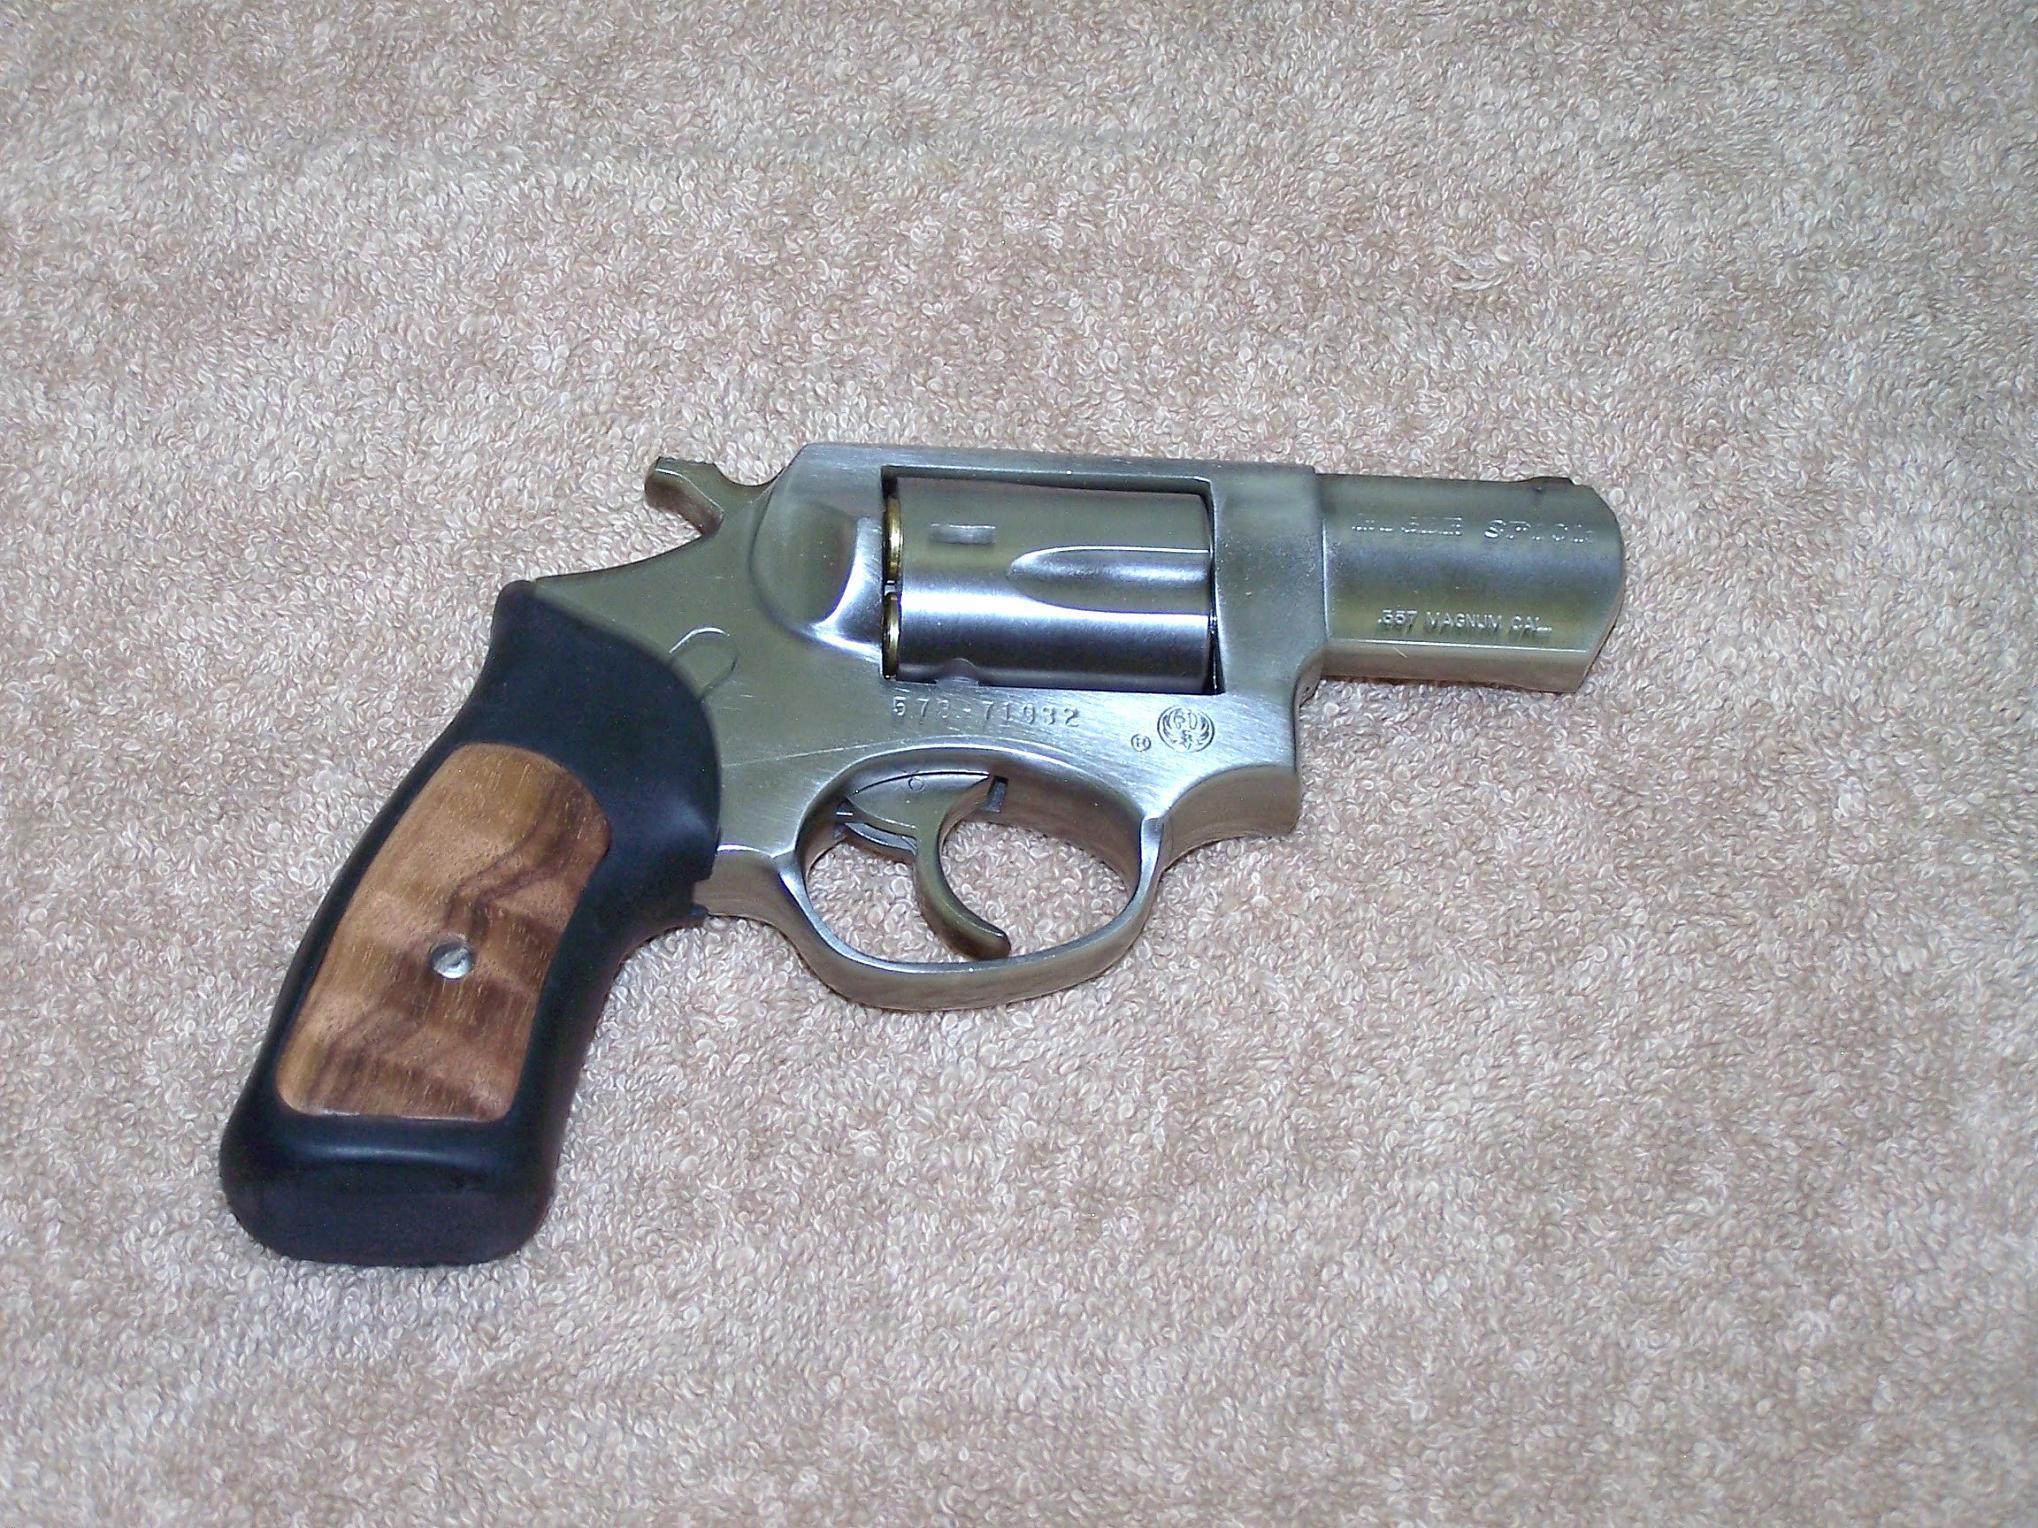 SP101 Small grip-008.jpg